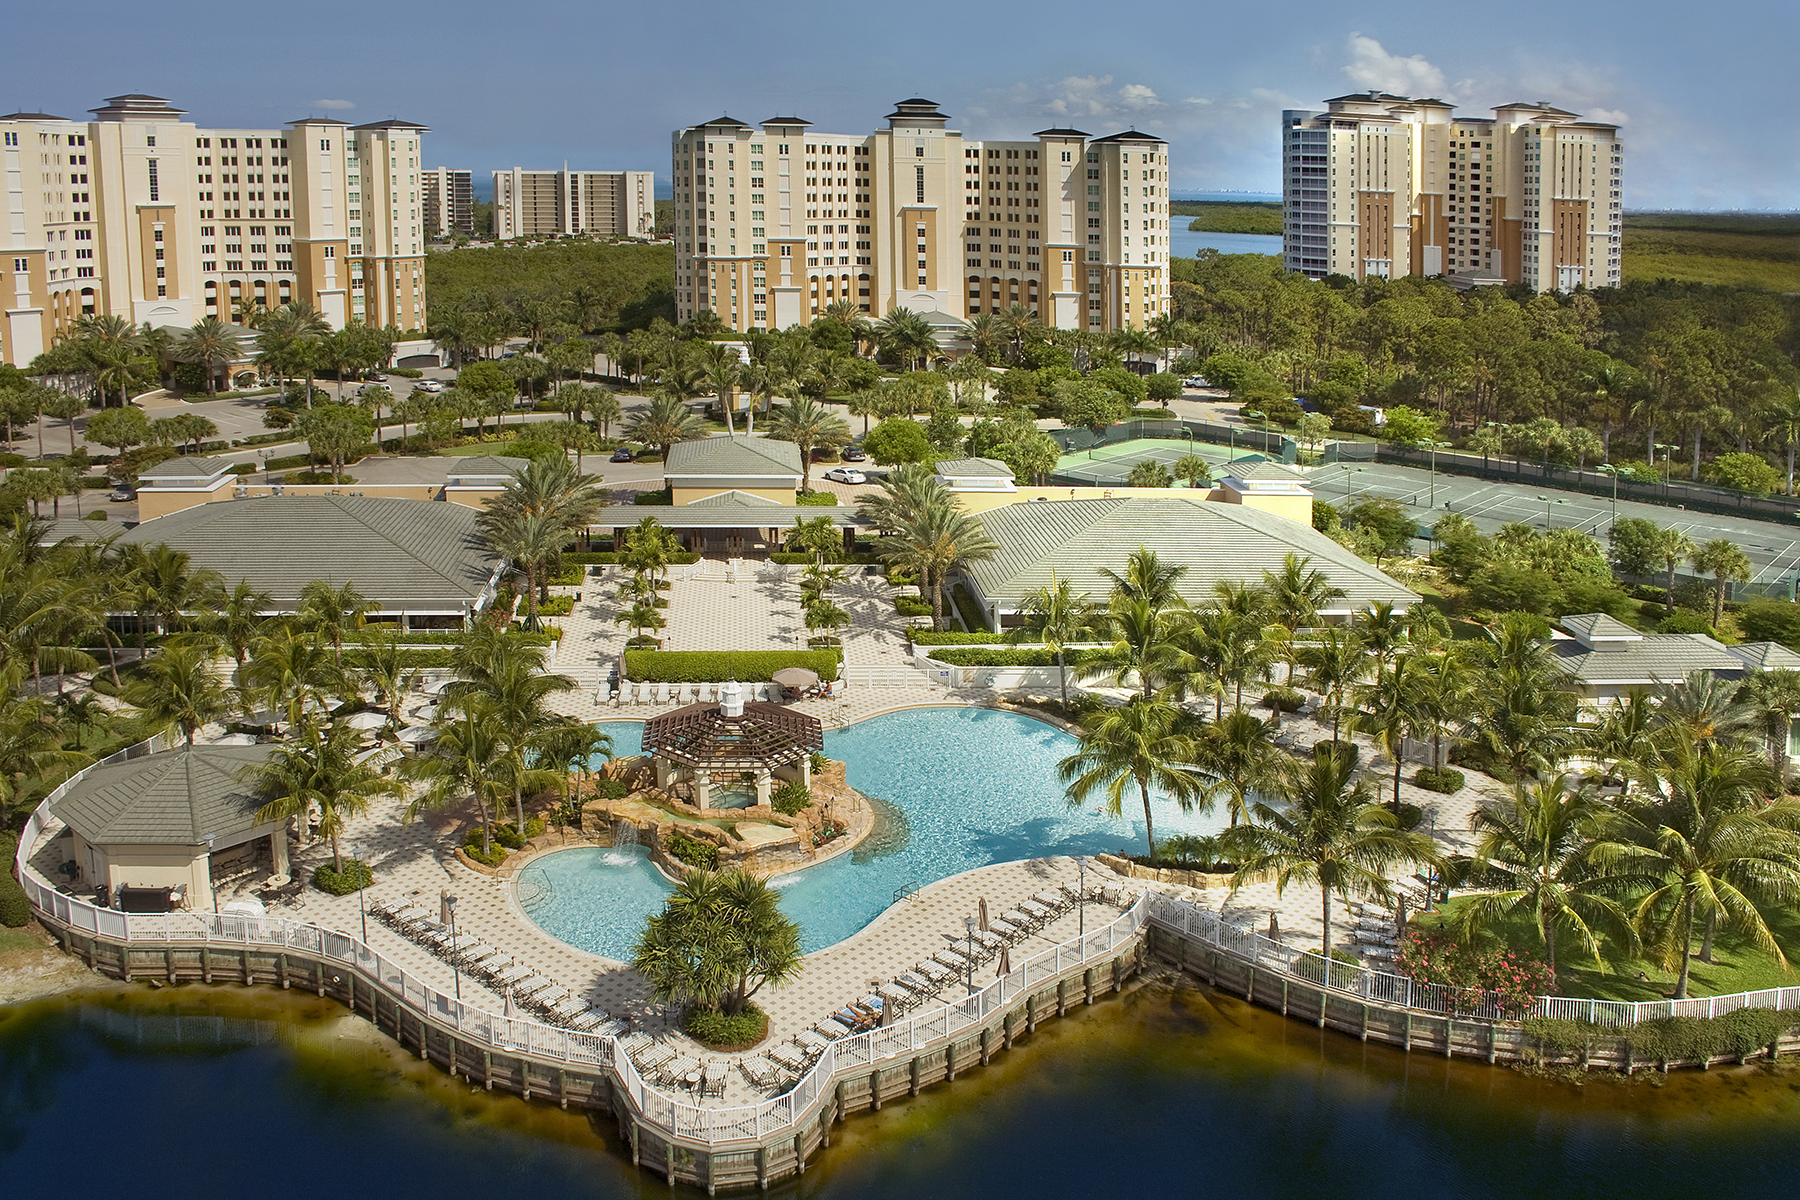 Condominium for Sale at THE DUNES - GRANDE PHOENICIAN 275 Indies Way 706 Naples, Florida, 34110 United States